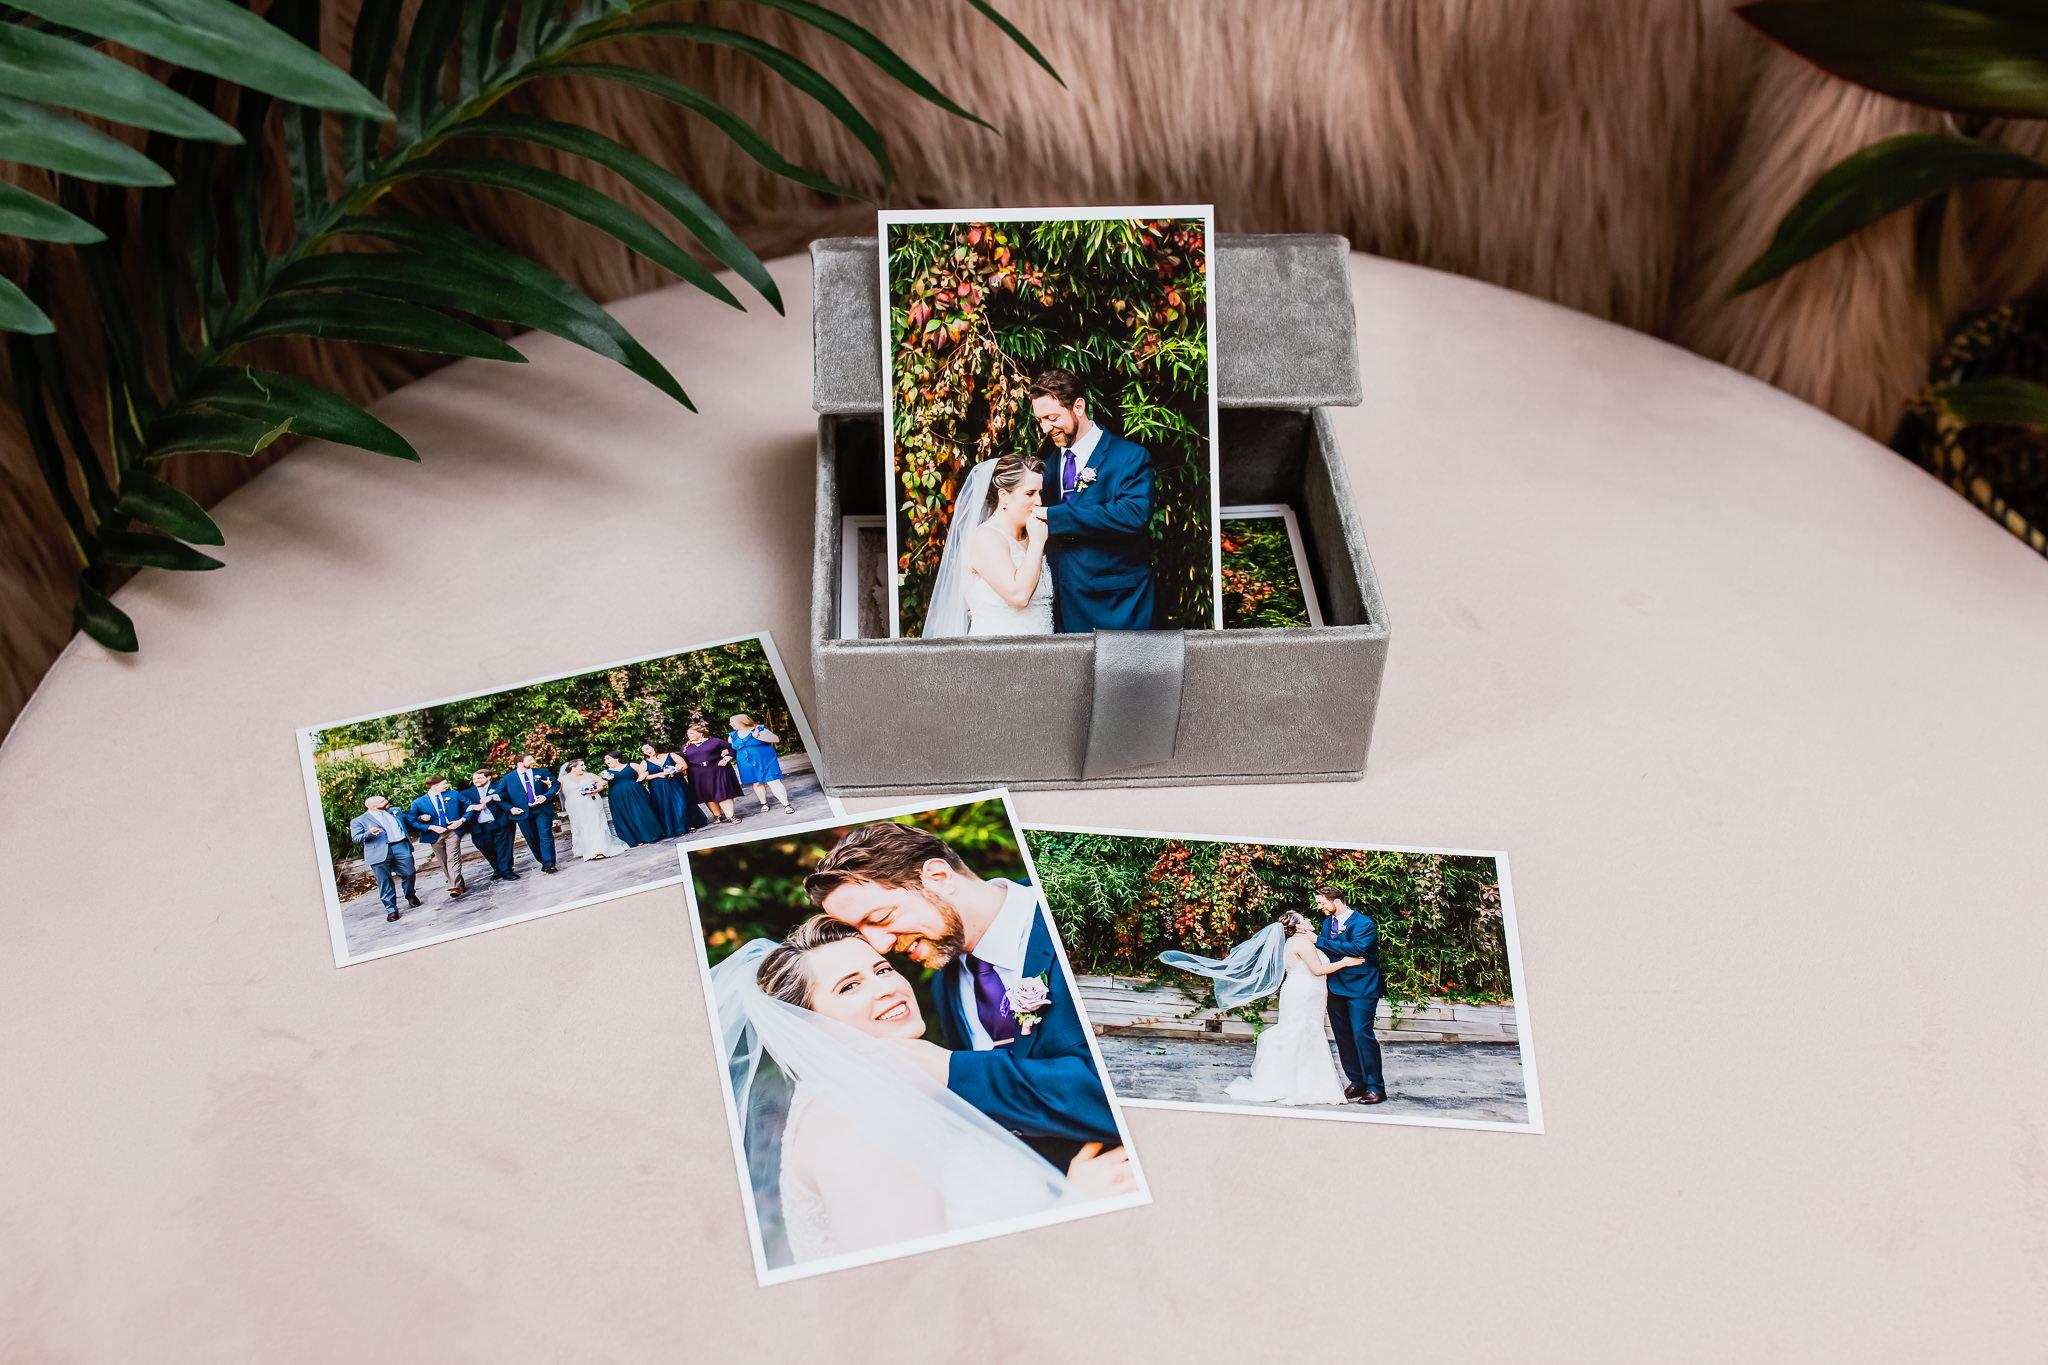 Velvet print box with colorful wedding photos